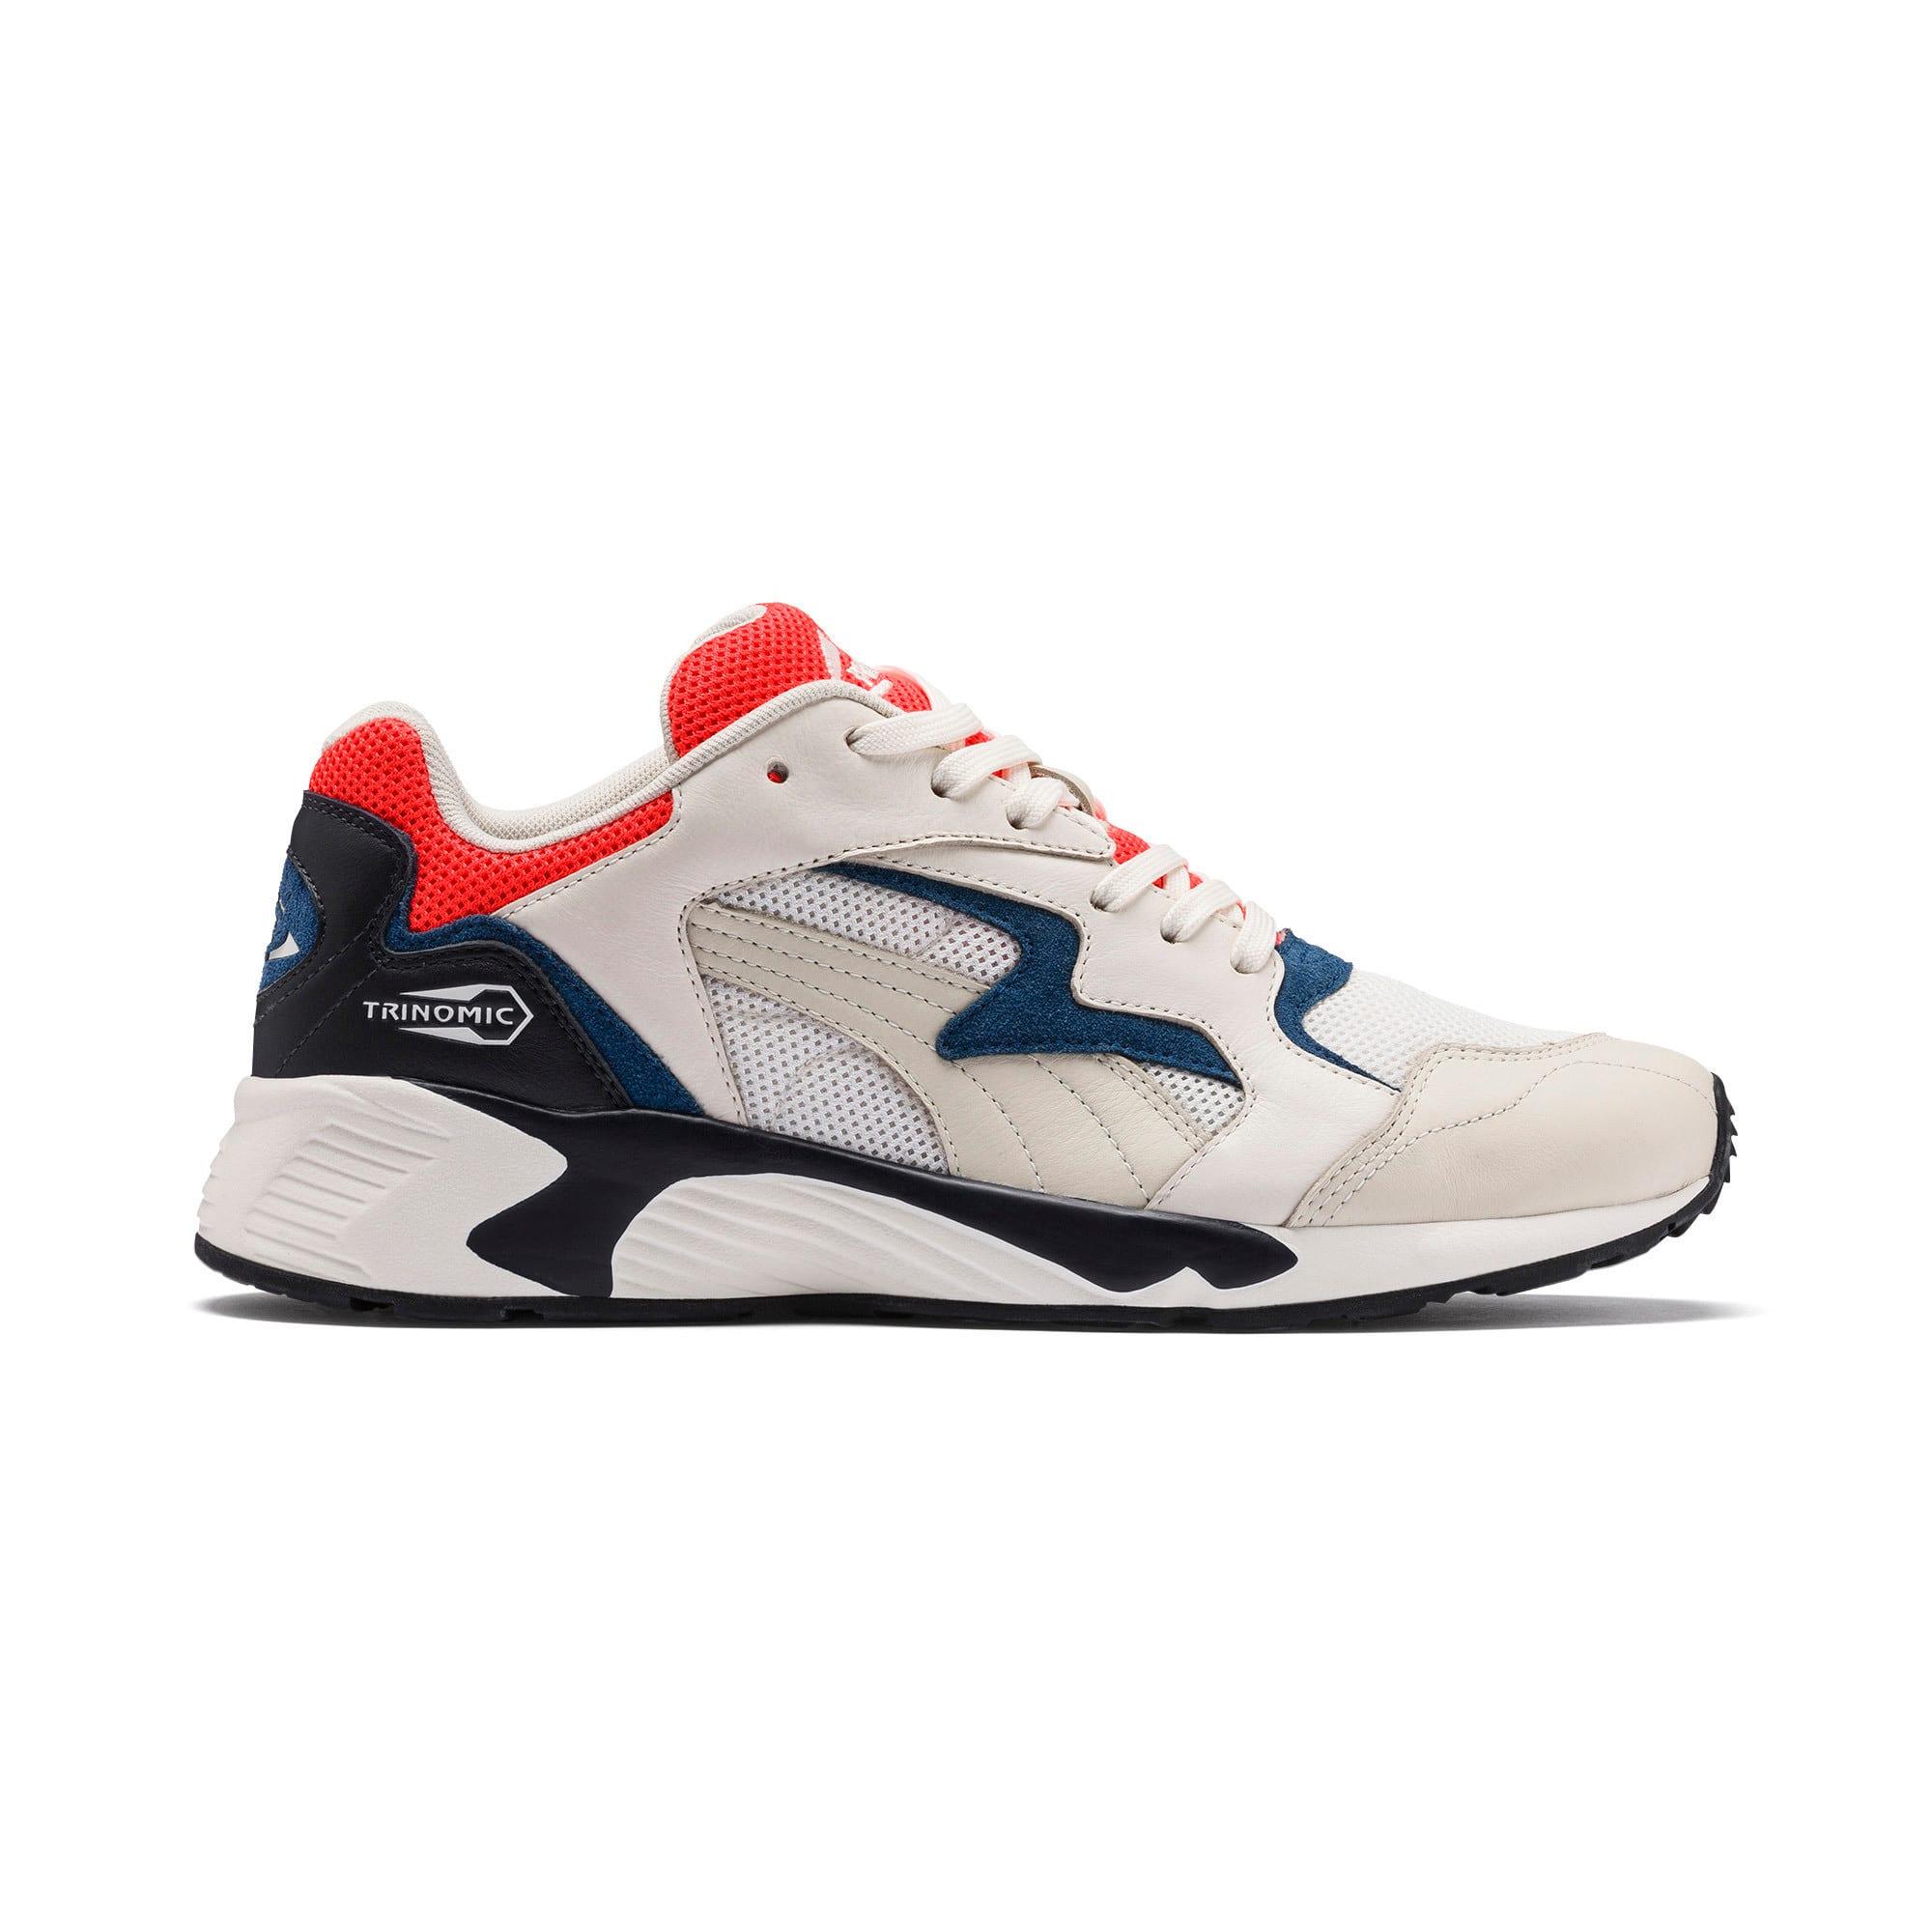 Thumbnail 5 of Prevail Classic Sneakers, Whisper White-Nrgy Red, medium